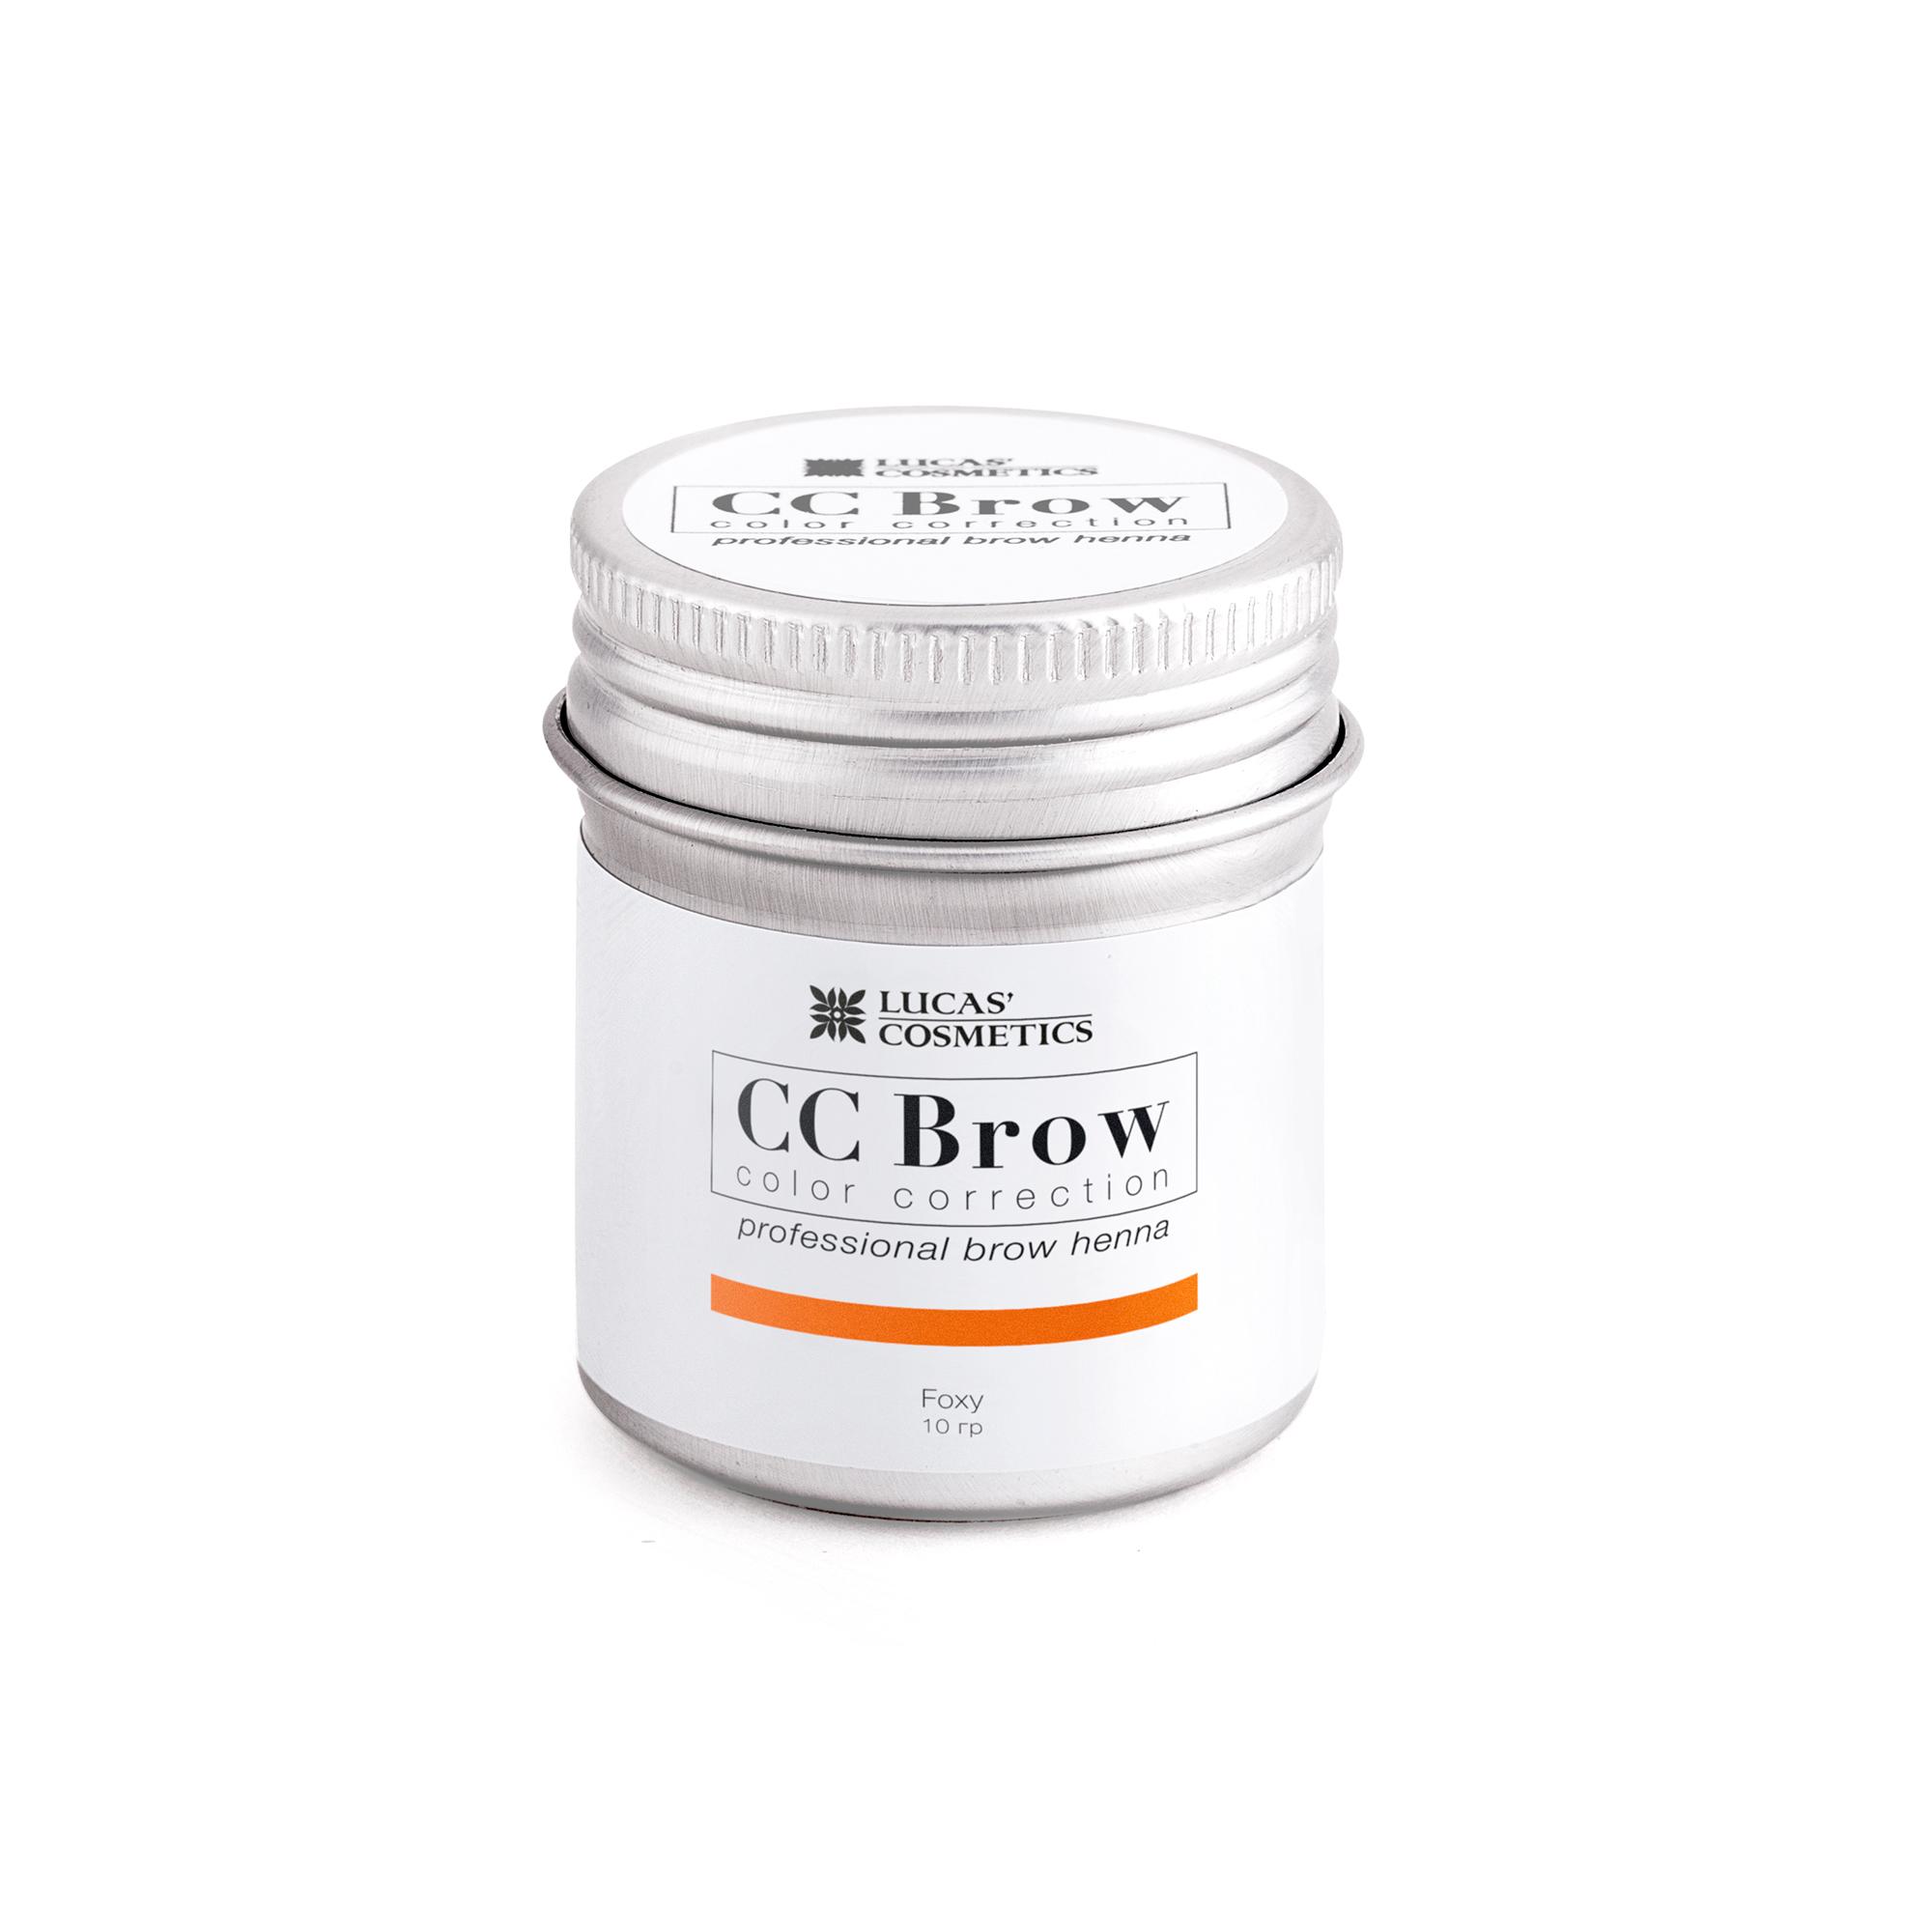 LUCAS' COSMETICS Хна для бровей в баночке (рыжий) / CC Brow (foxy), 10 гр